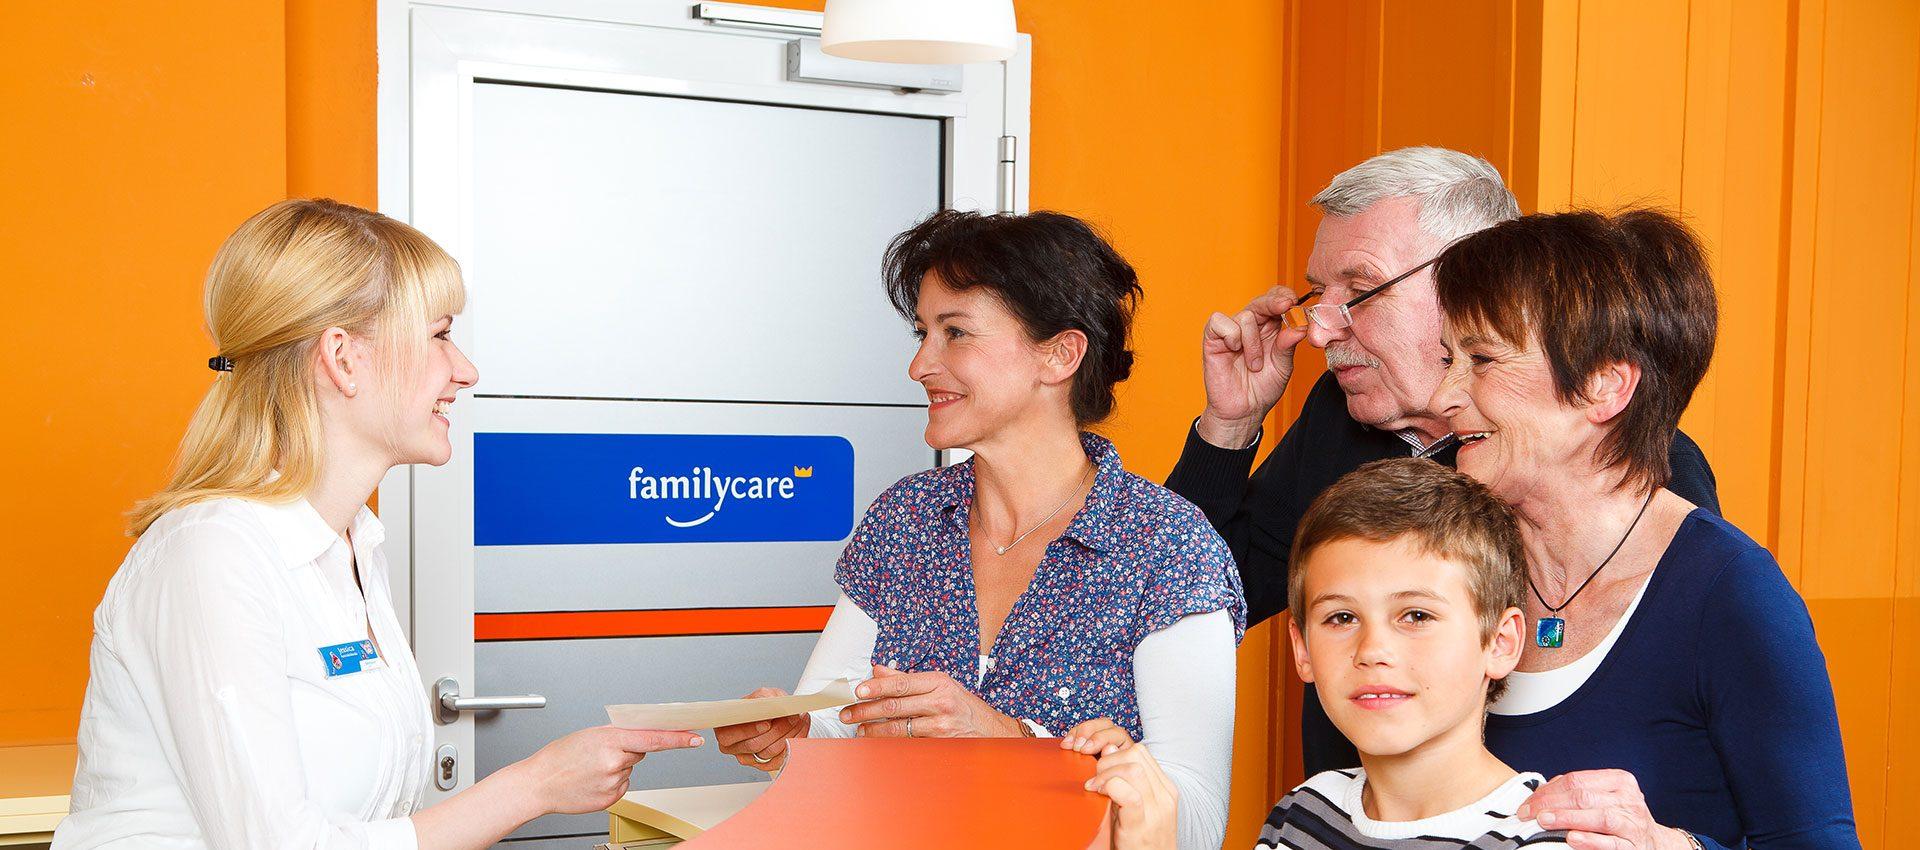 familycare-berlin